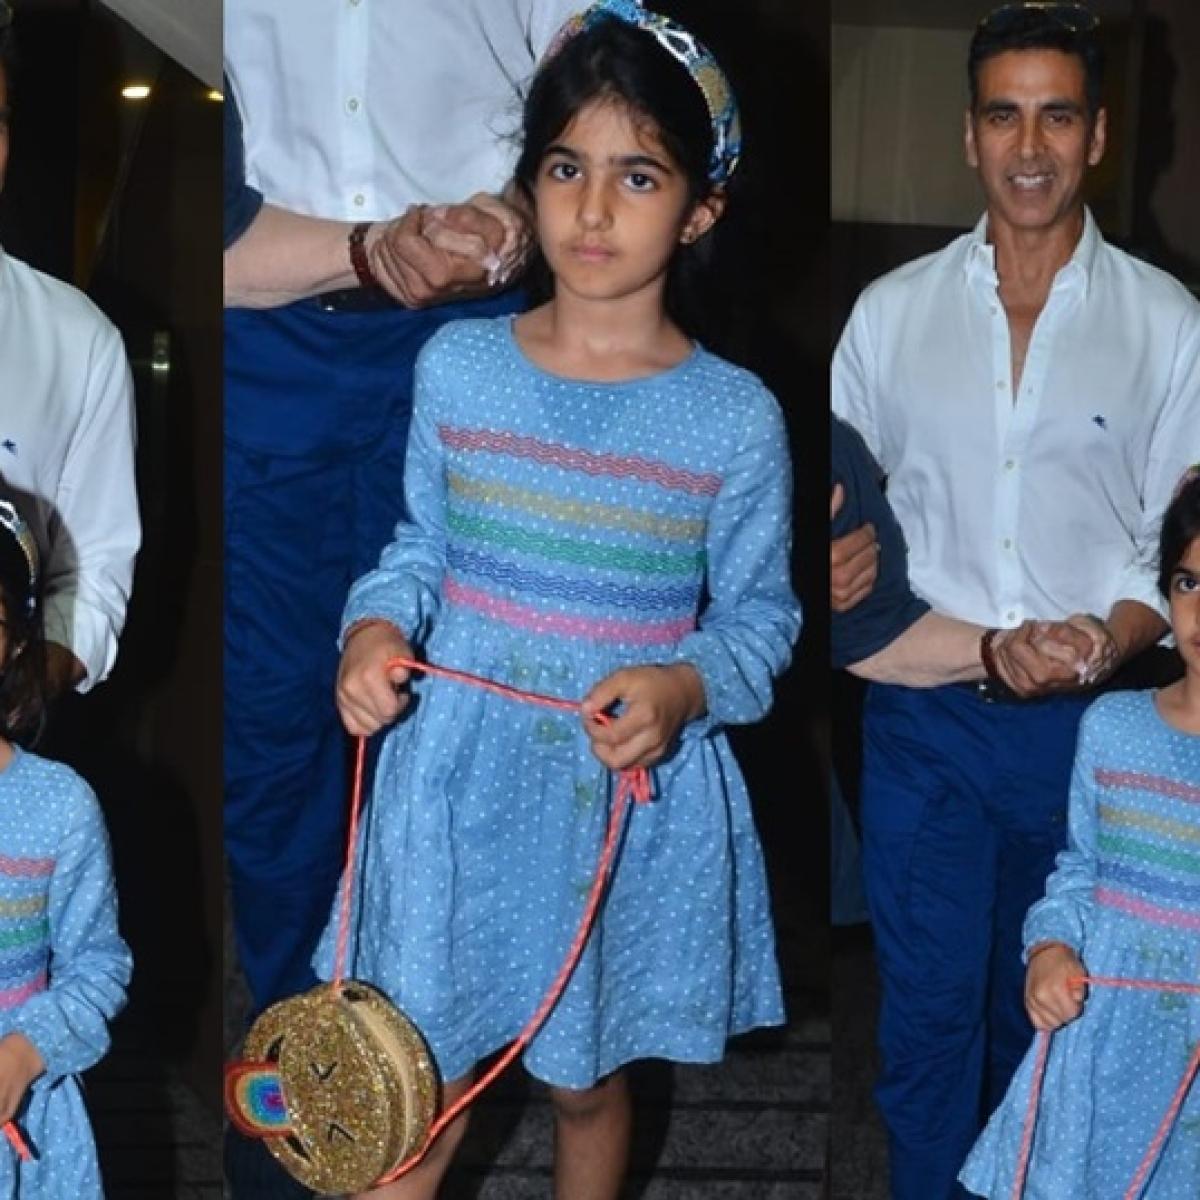 Akshay Kumar's daughter Nitara is already setting fashion goals with her extraordinary sling bag